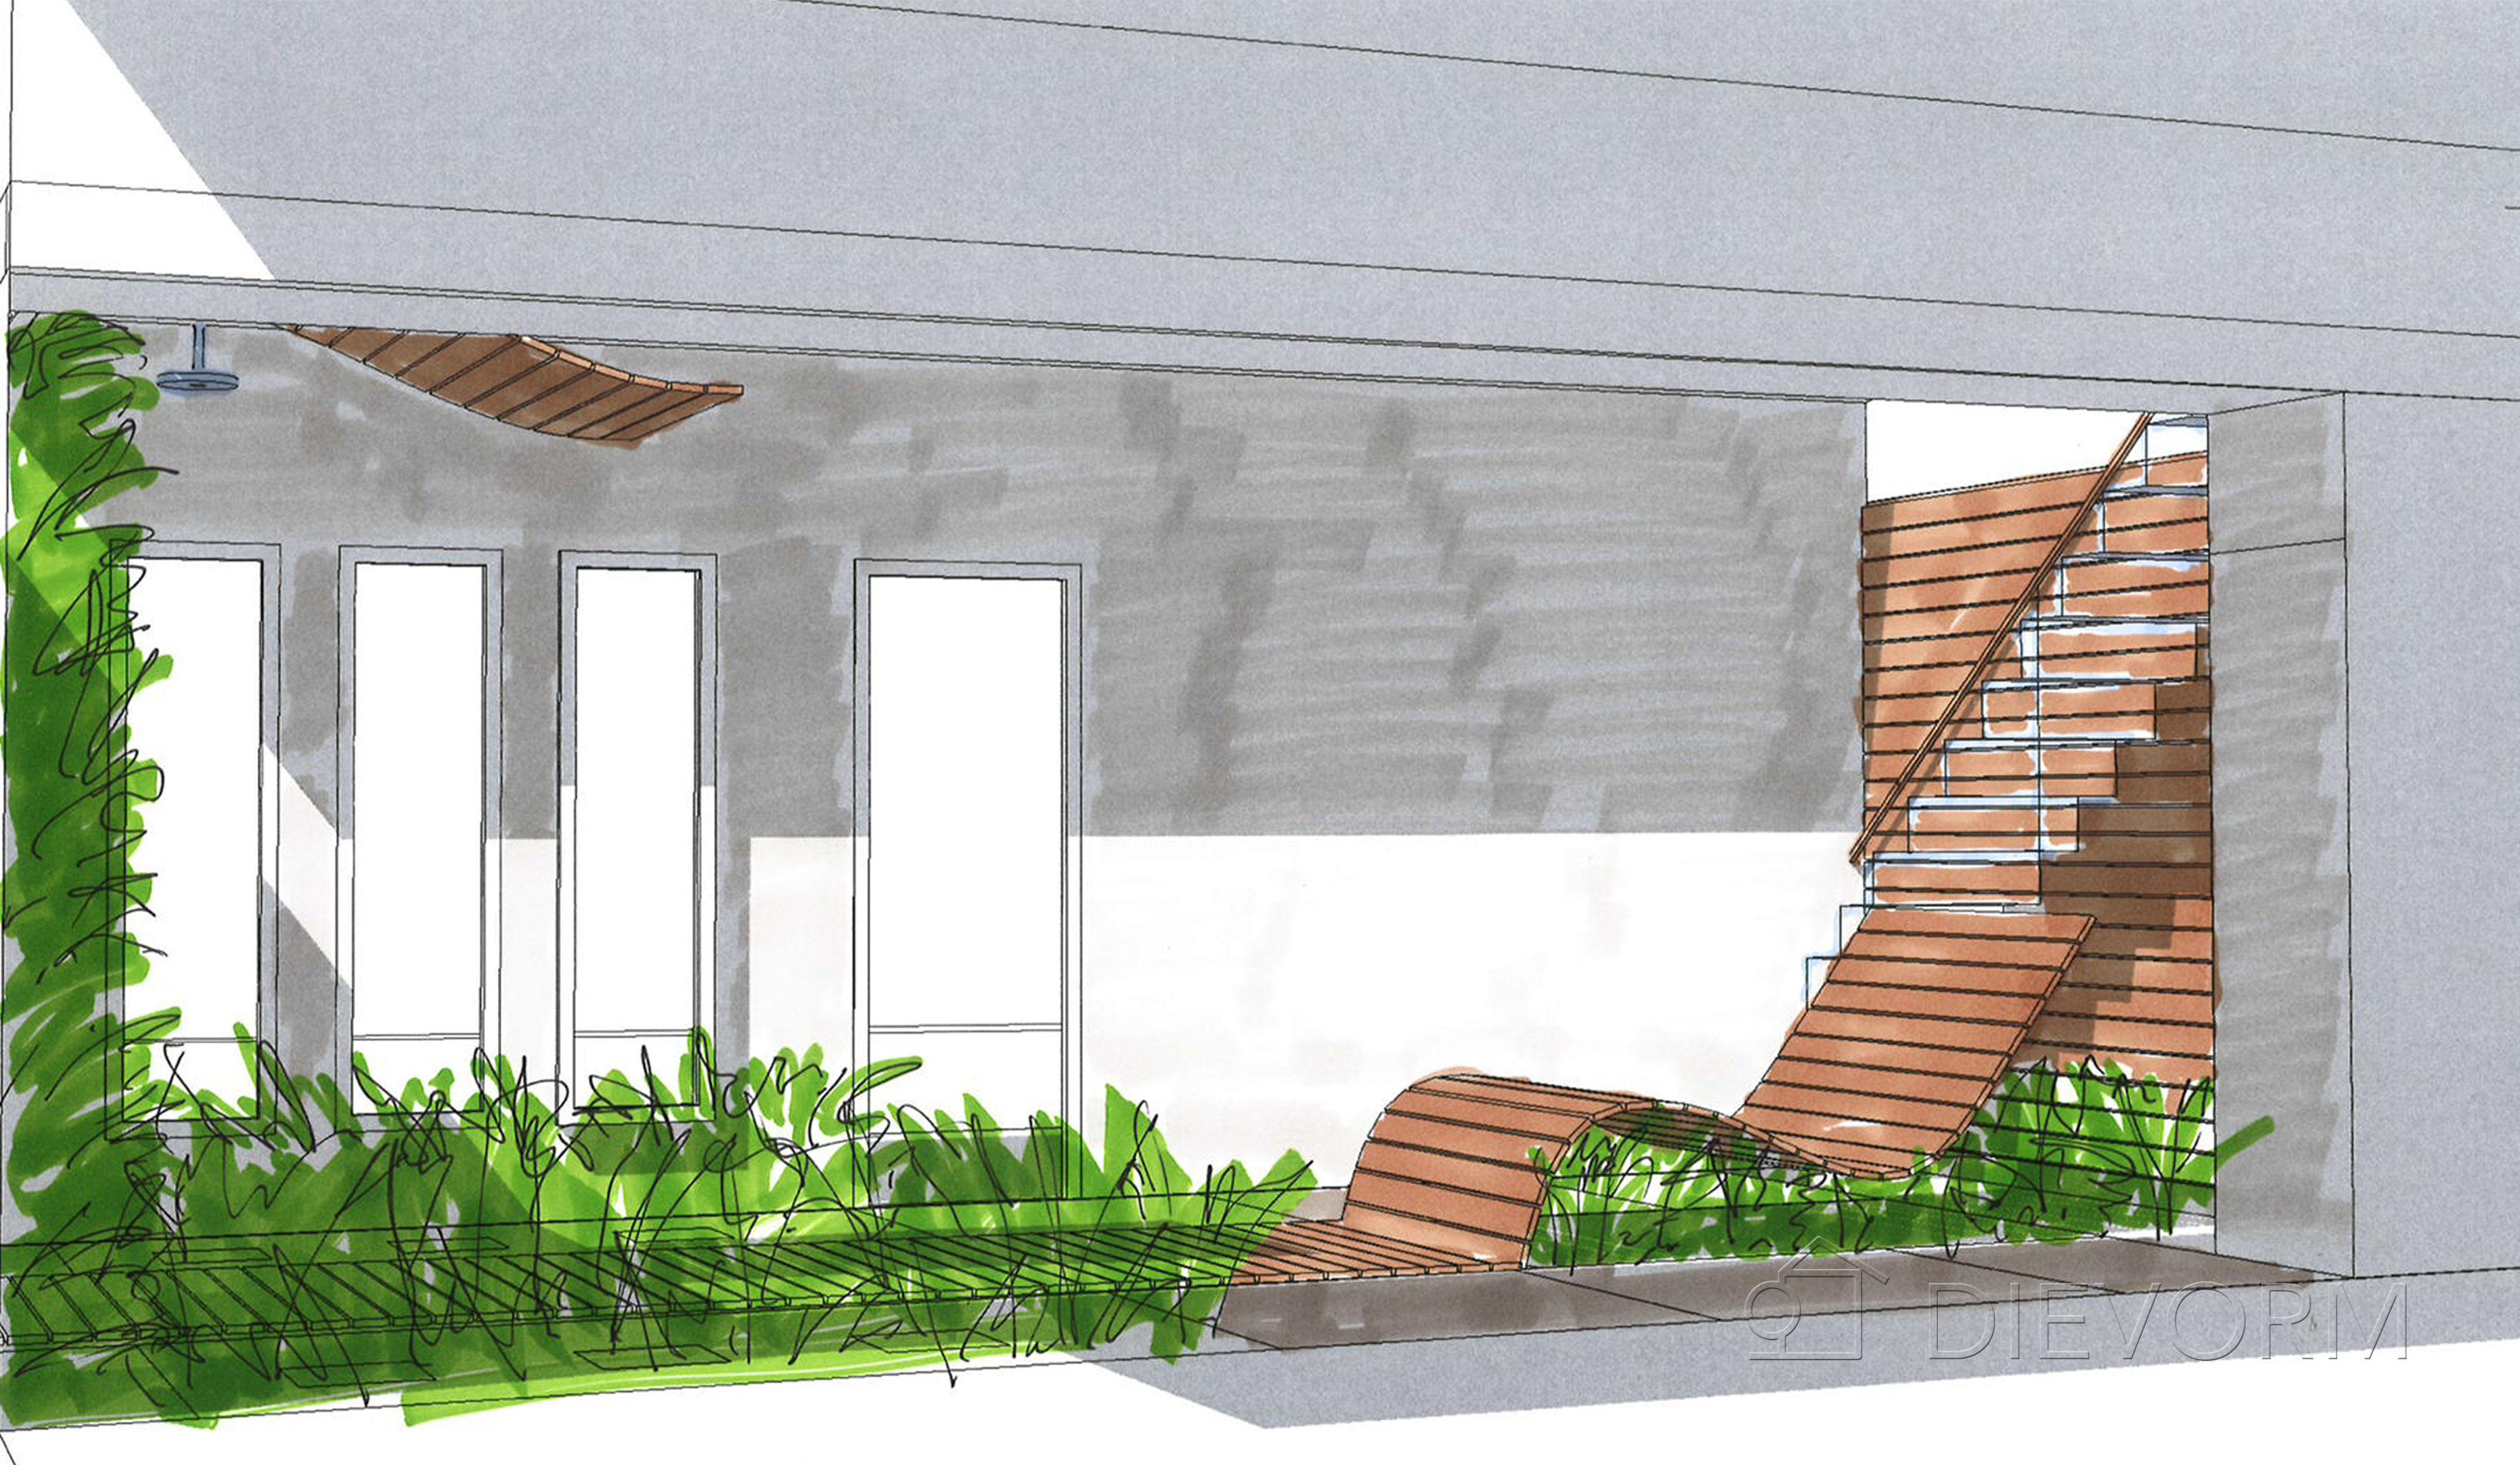 tuinbank design dievorm